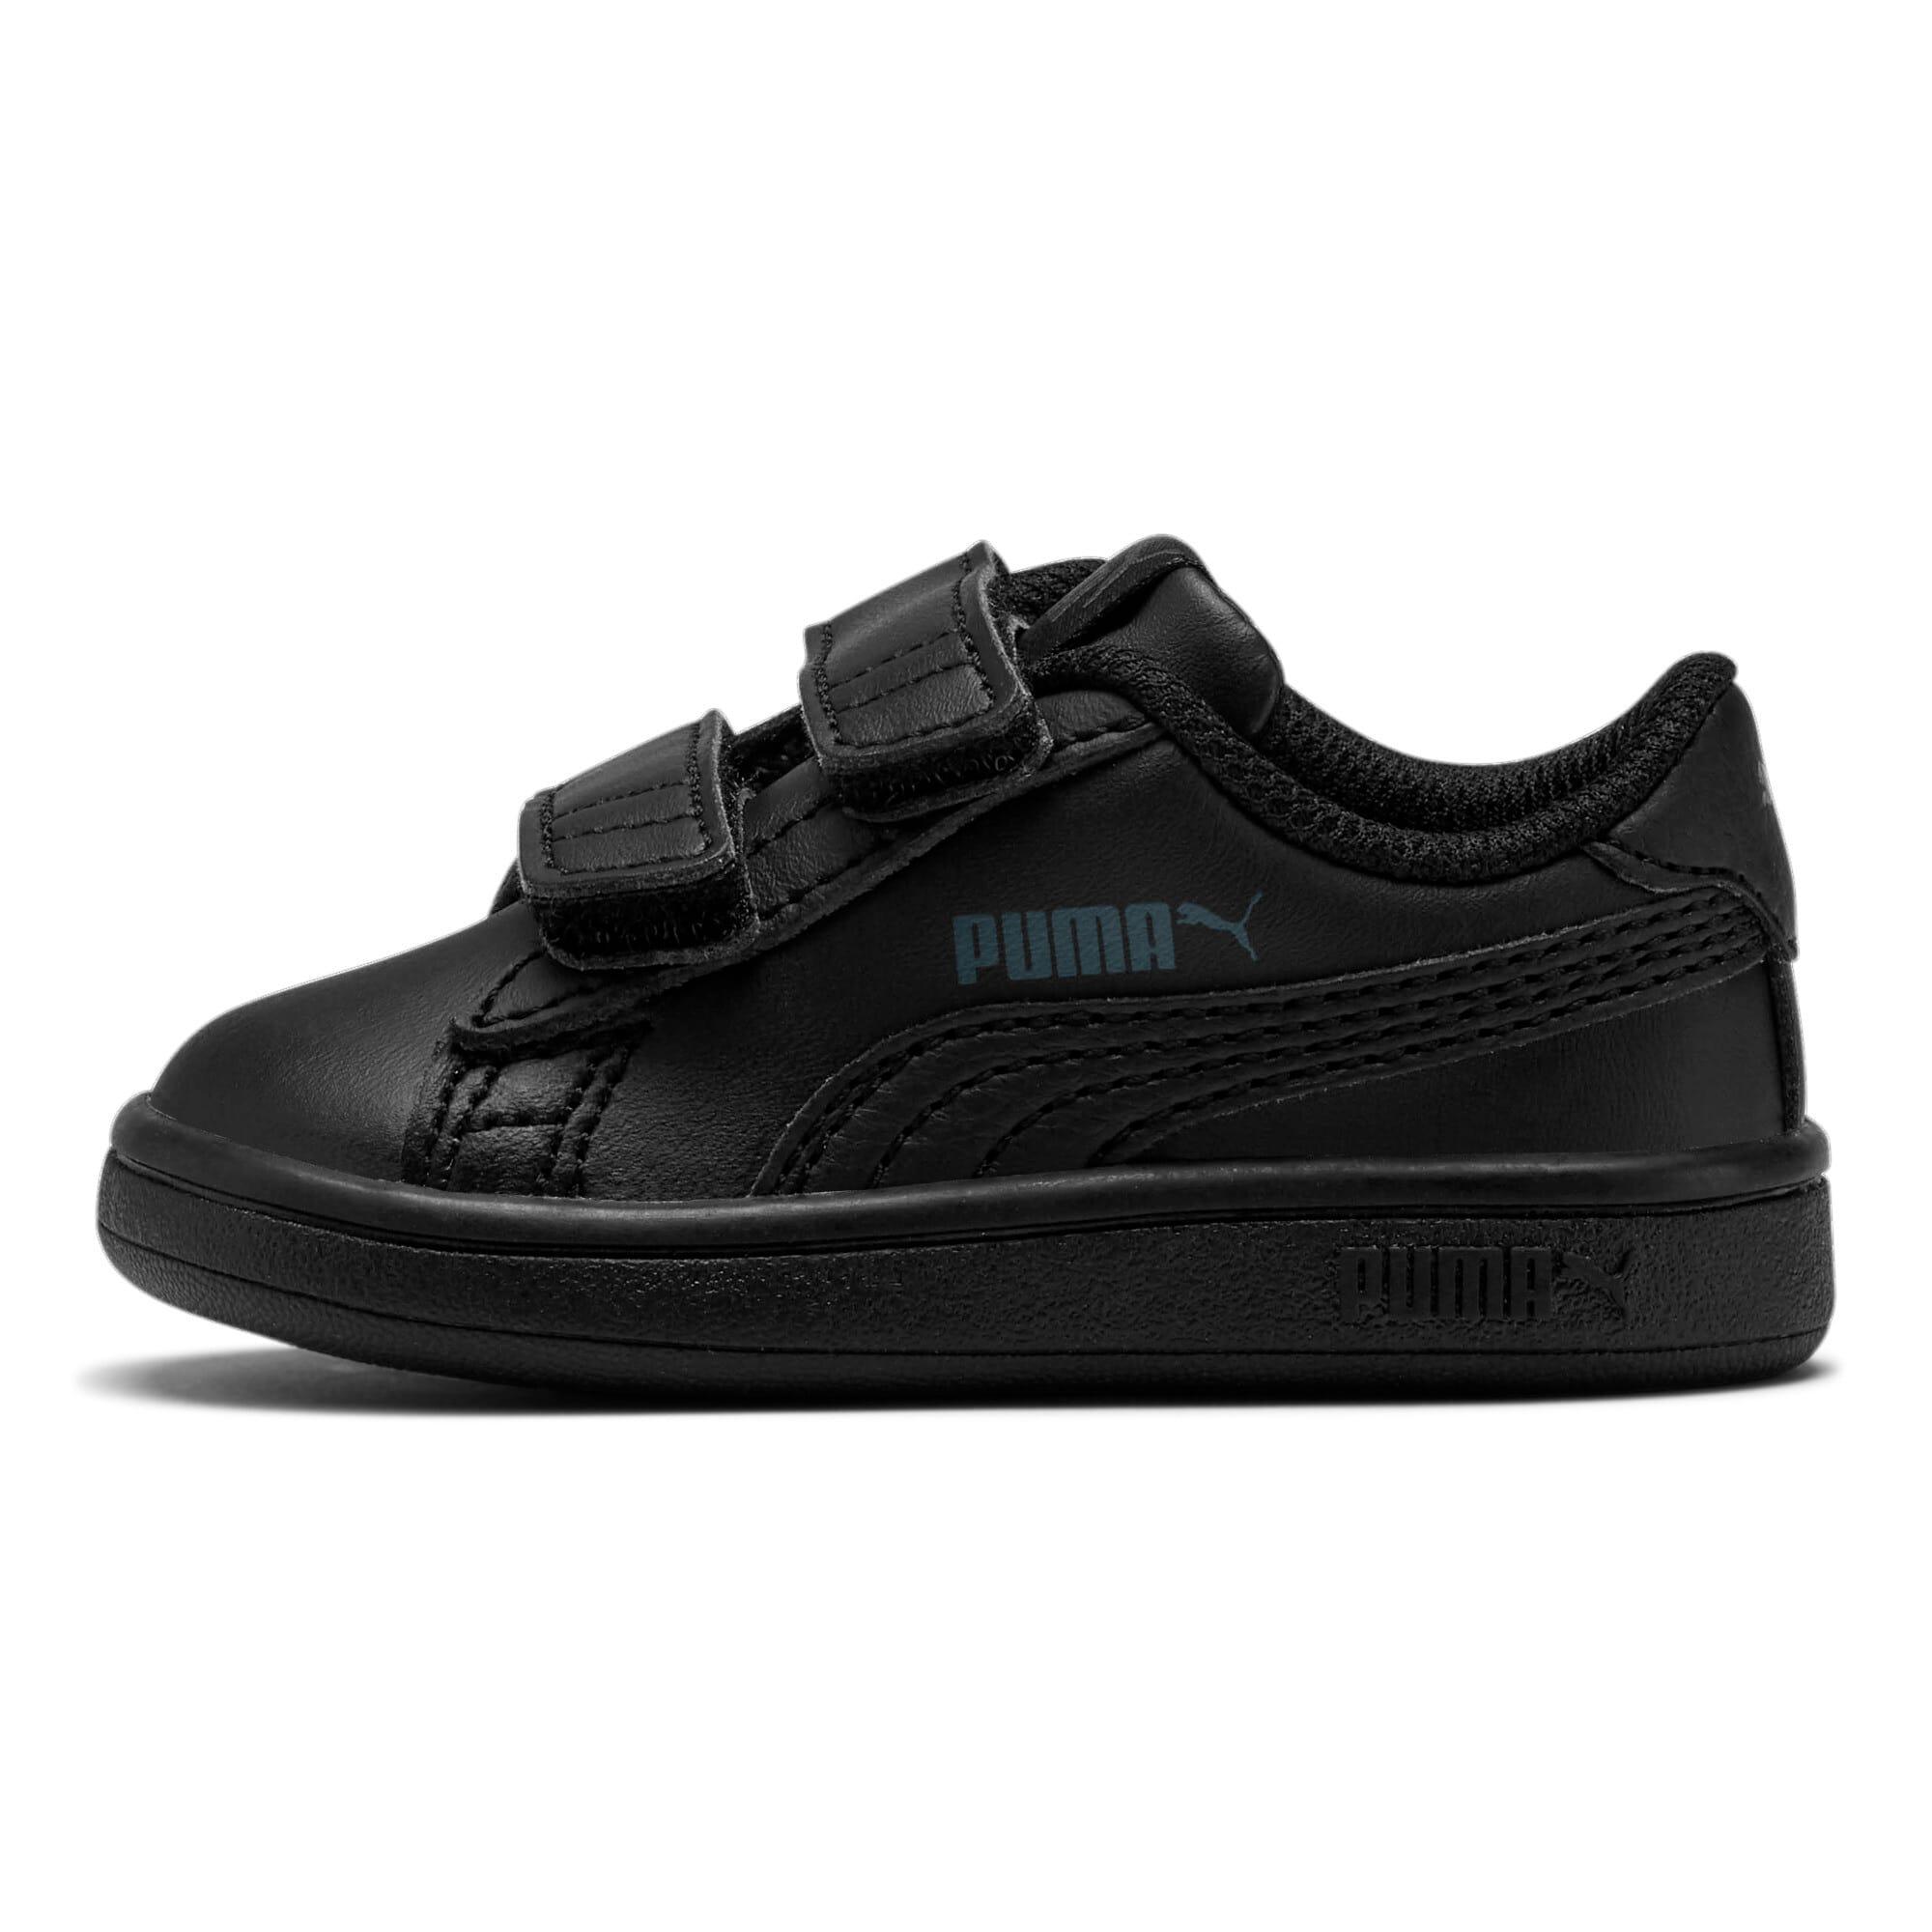 Thumbnail 1 of Puma Smash v2 L V Toddler Shoes, Puma Black-Puma Black, medium